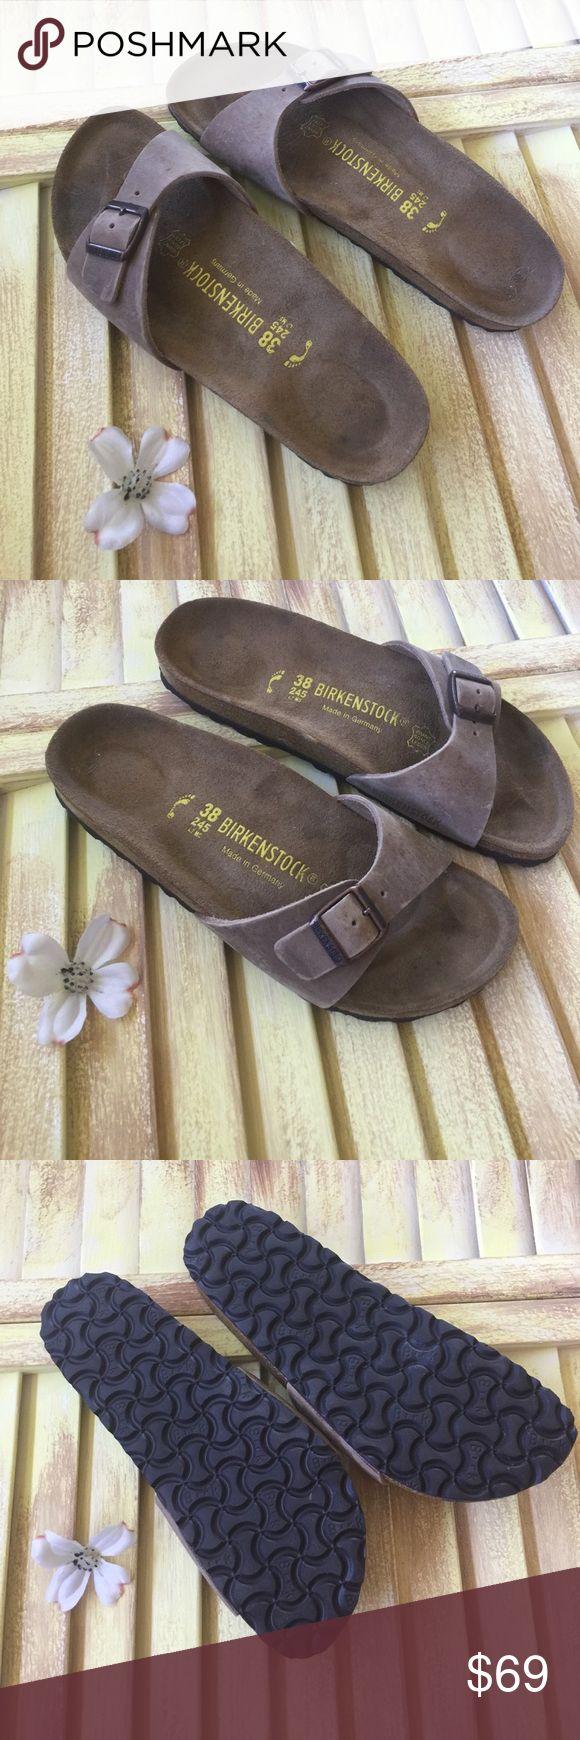 🆕Birkenstock Orthopedic Sandals Shoes L7 M5 New without tags! Birkenstock Shoes Sandals